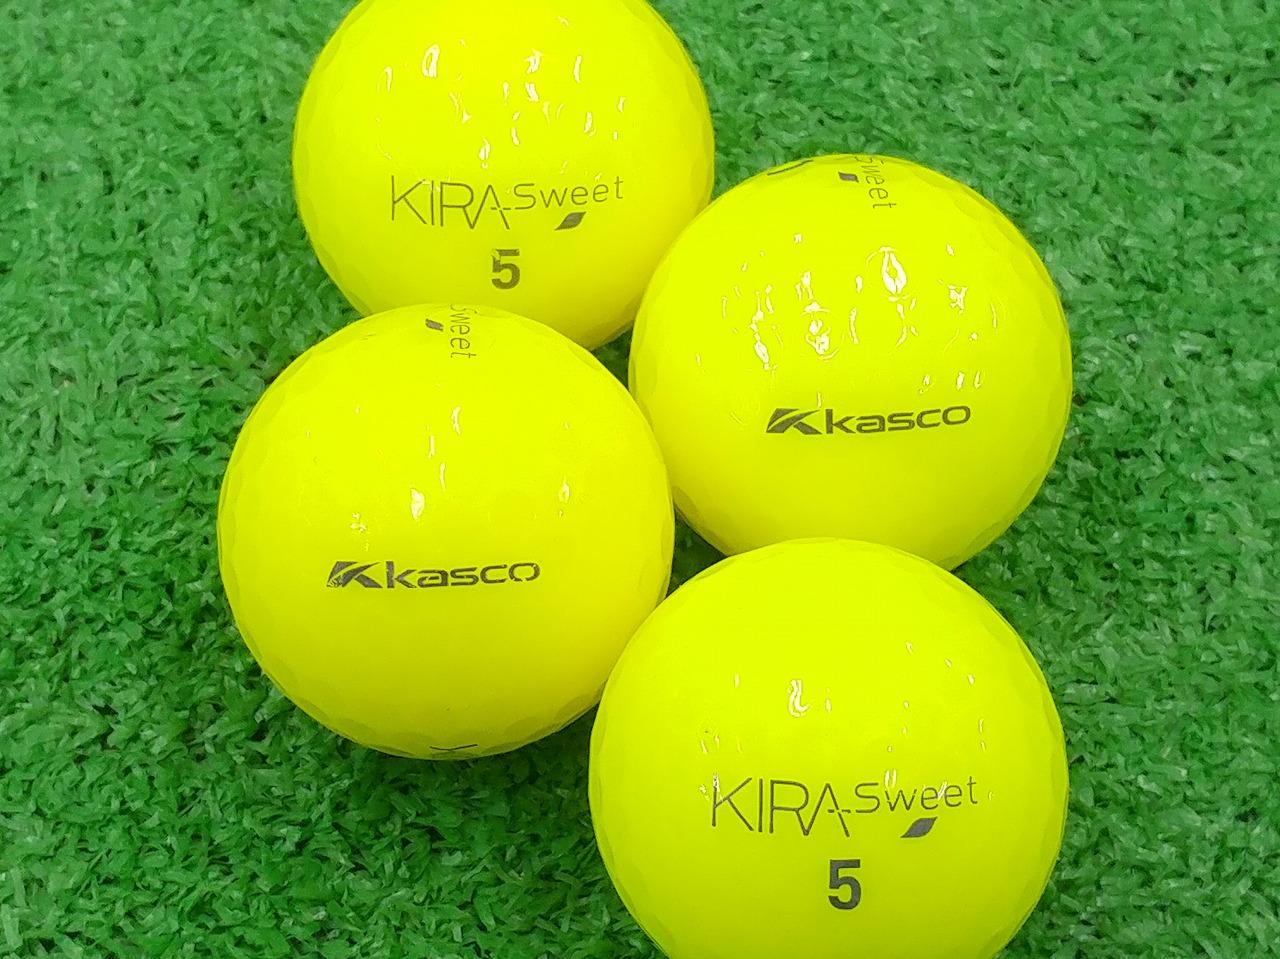 【ABランク】Kasco(キャスコ) KIRA Sweet イエロー 2013年モデル 1個